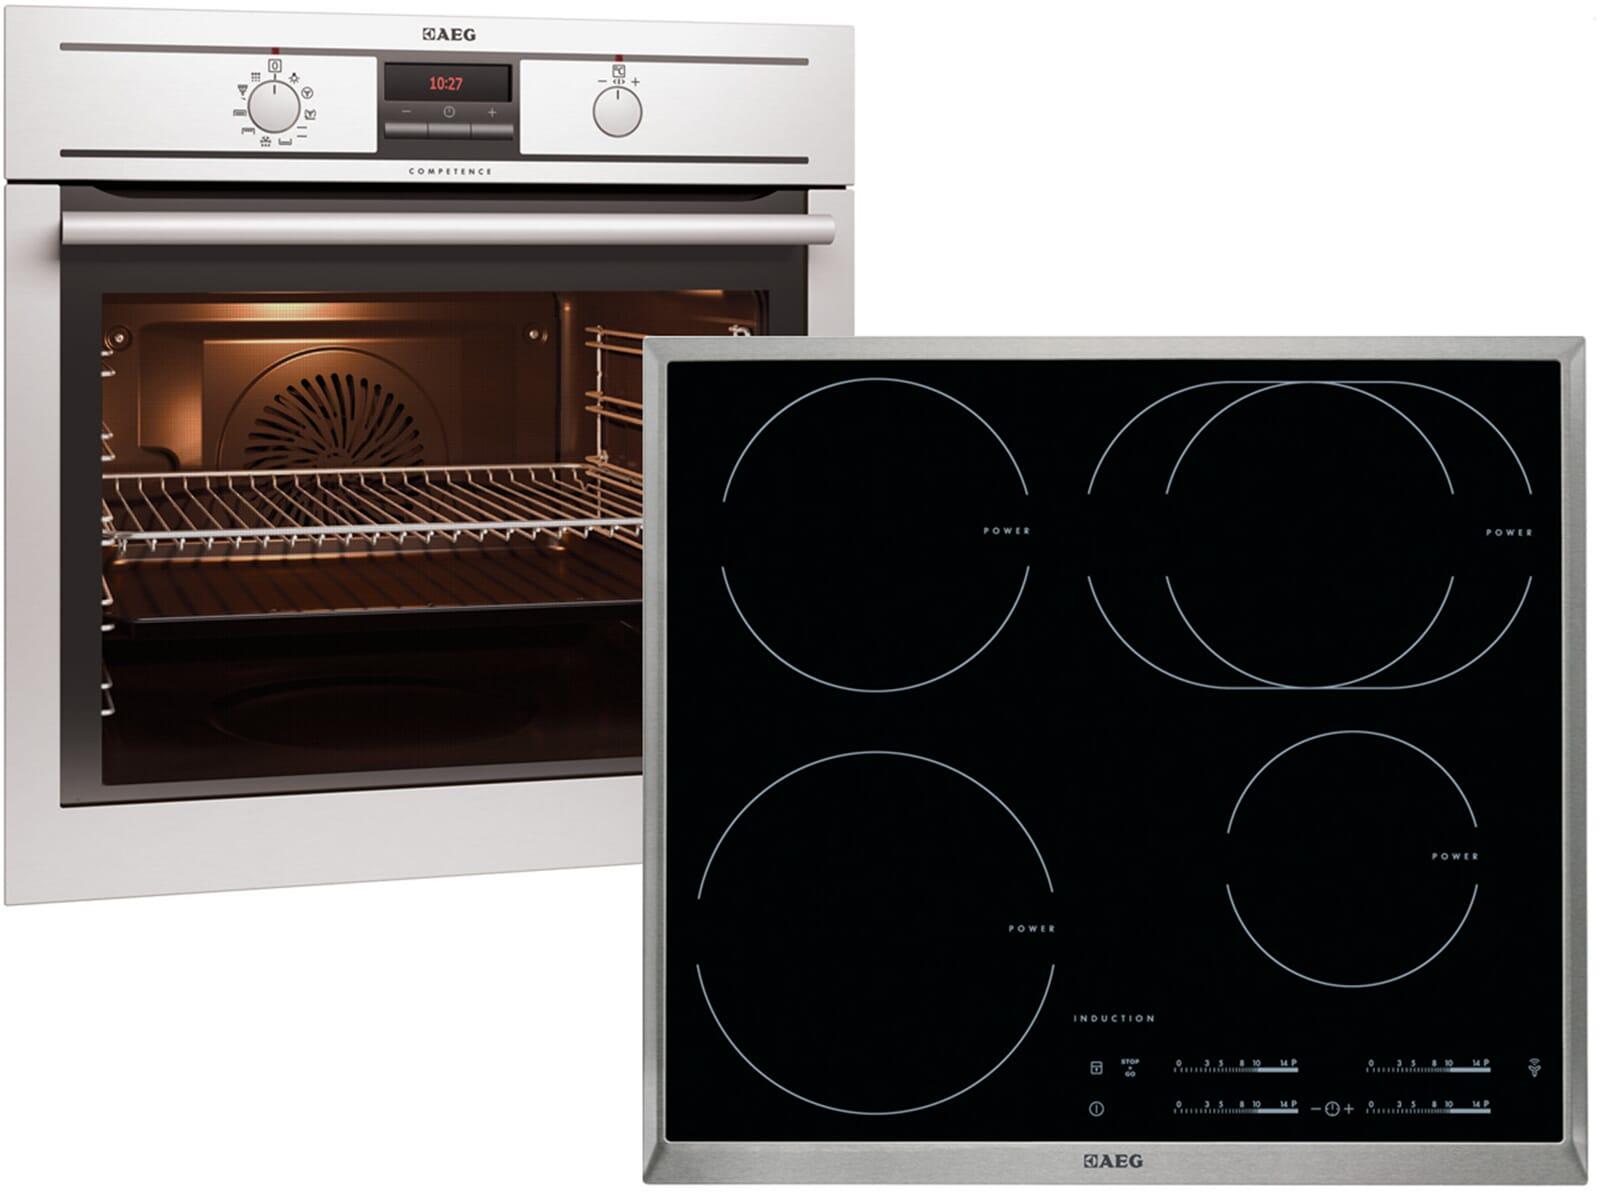 aeg bp31966 set pyrolyse backofen bp3003001m induktionskochfeld hk6542h1x b ebay. Black Bedroom Furniture Sets. Home Design Ideas